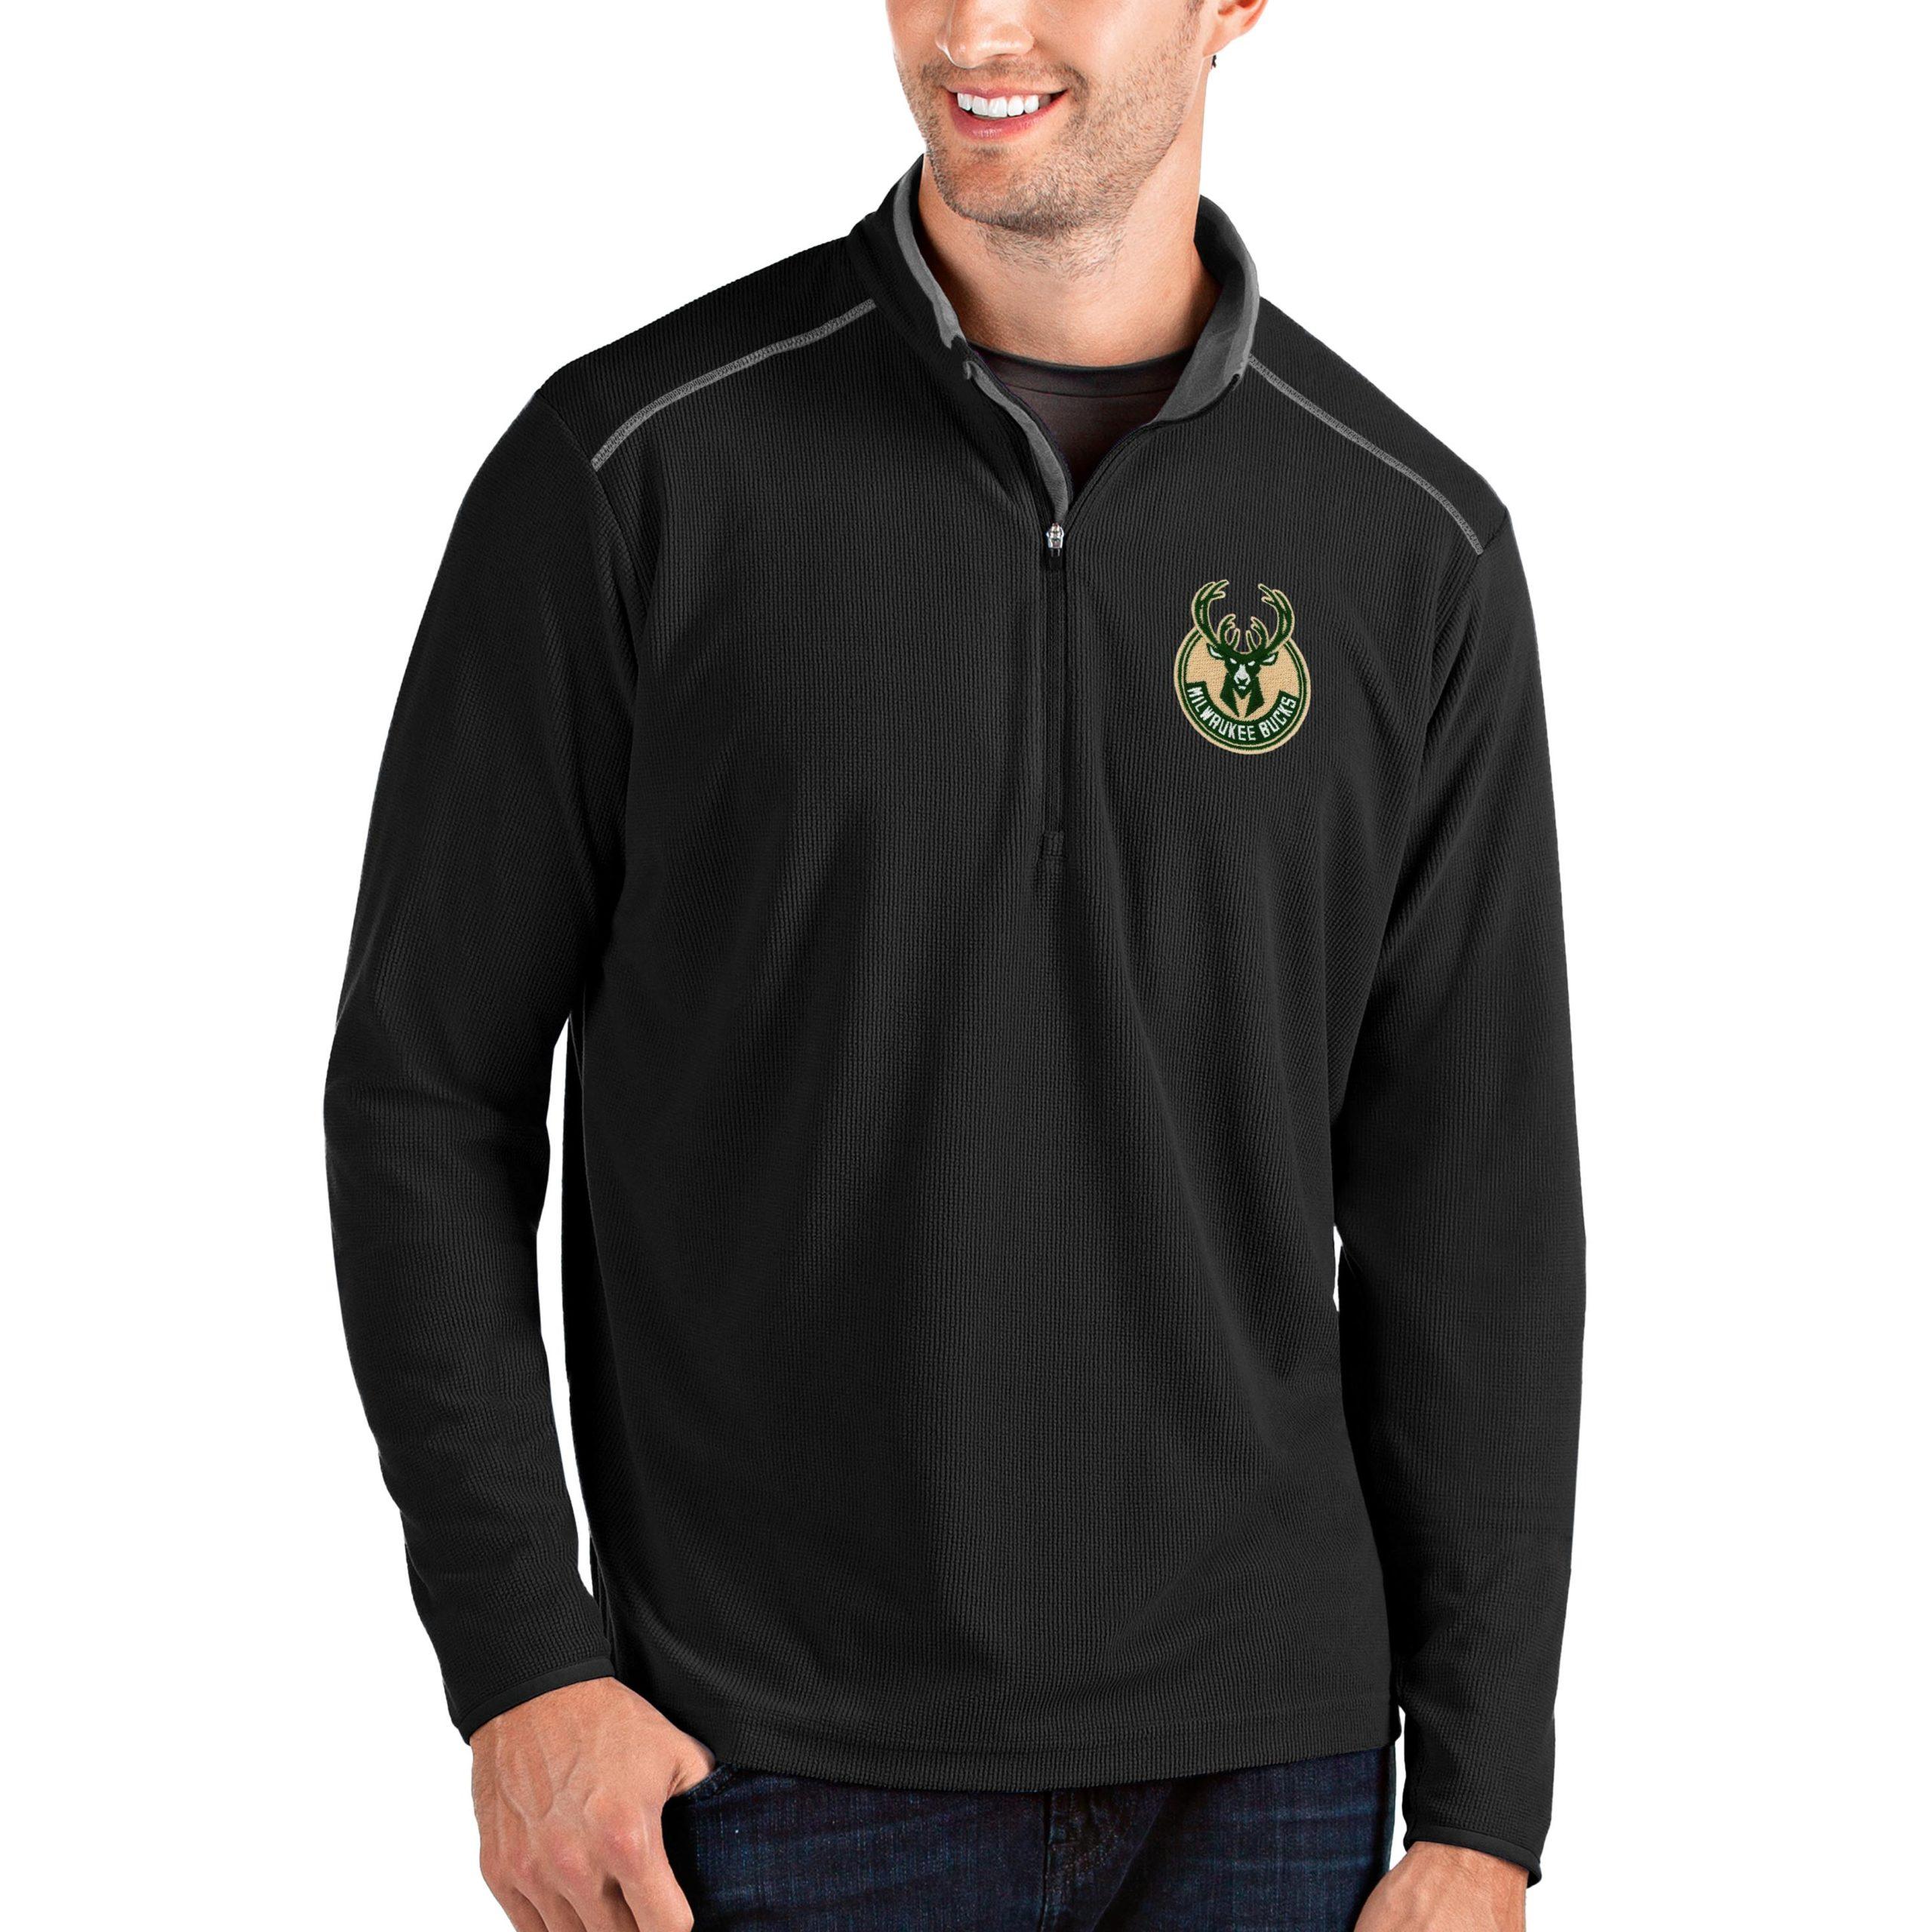 Milwaukee Bucks Antigua Big & Tall Glacier Quarter-Zip Pullover Jacket - Black/Gray